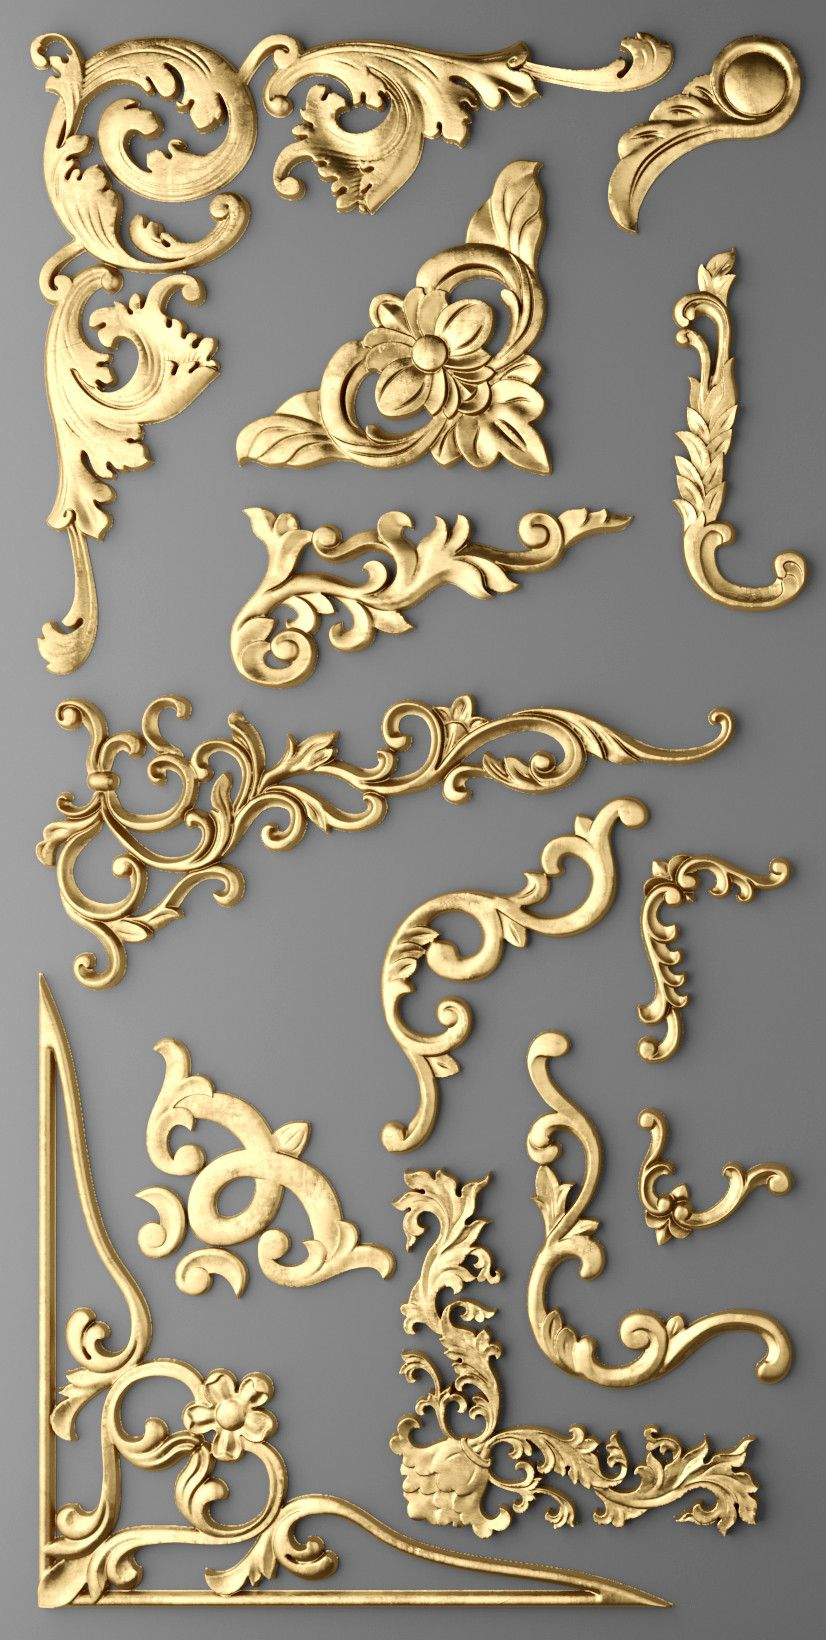 cartouches set 3d model | herreria | Pinterest | Ornamentos ...